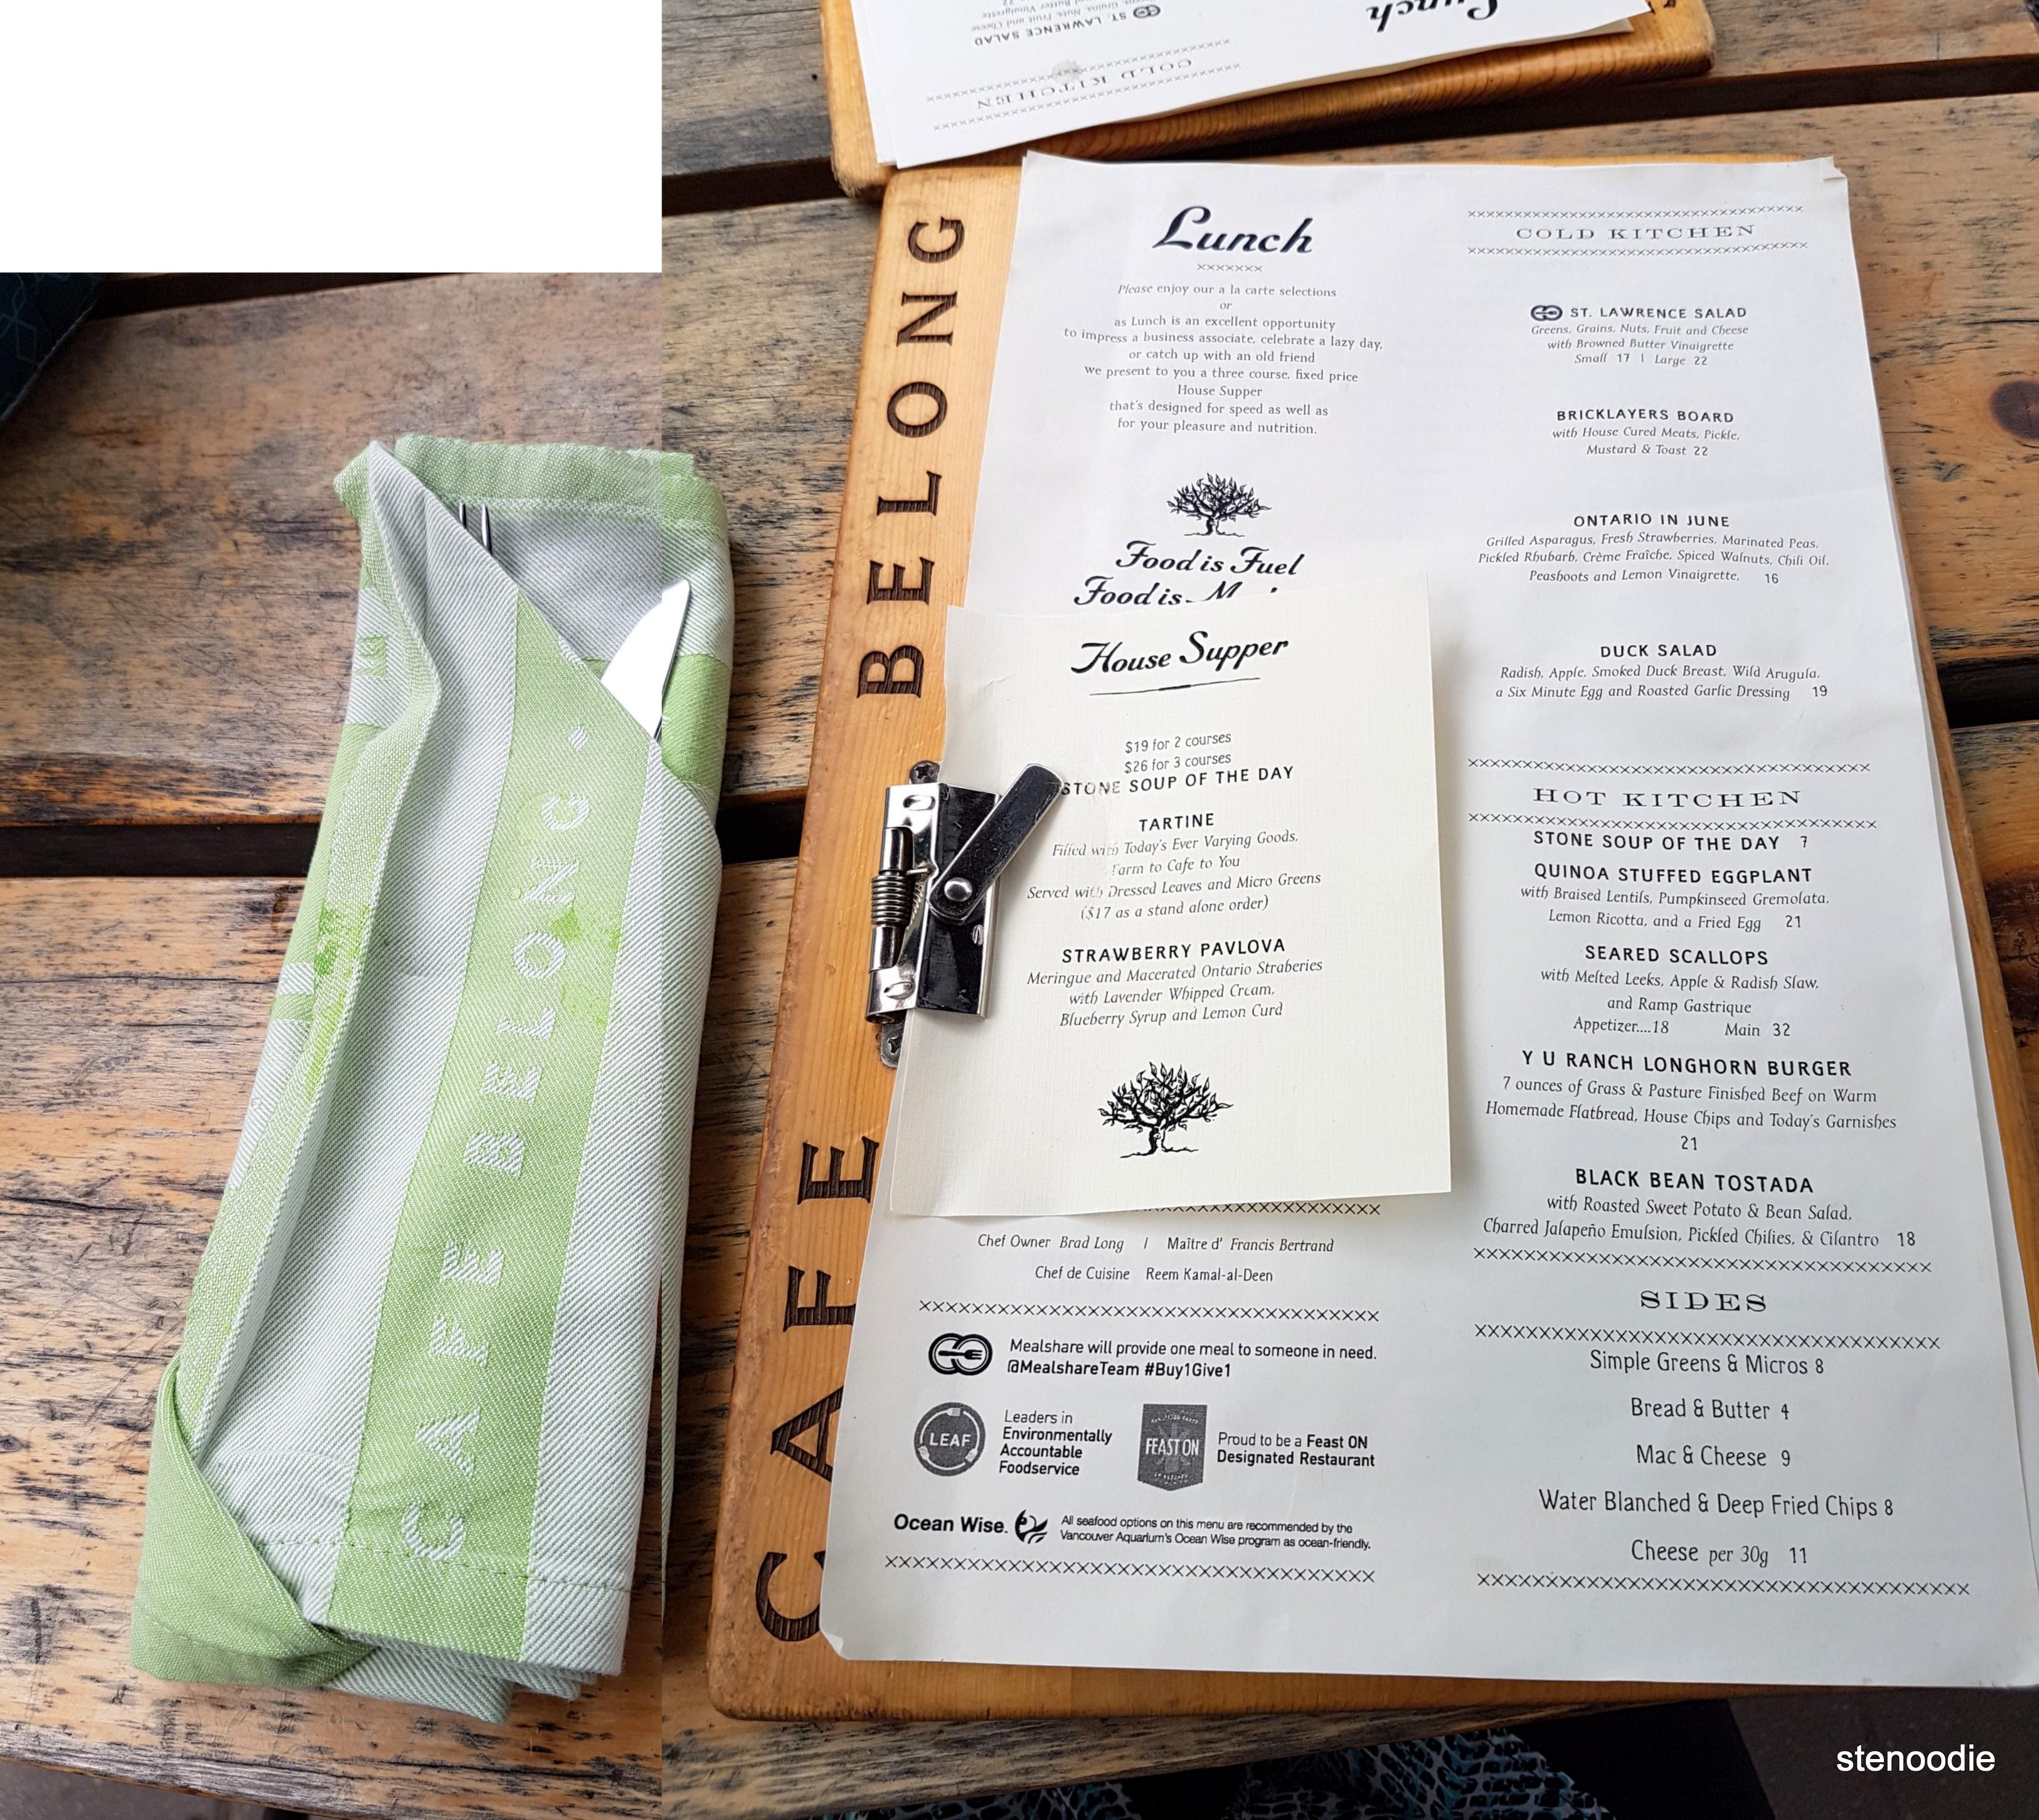 Cafe Belong lunch menu